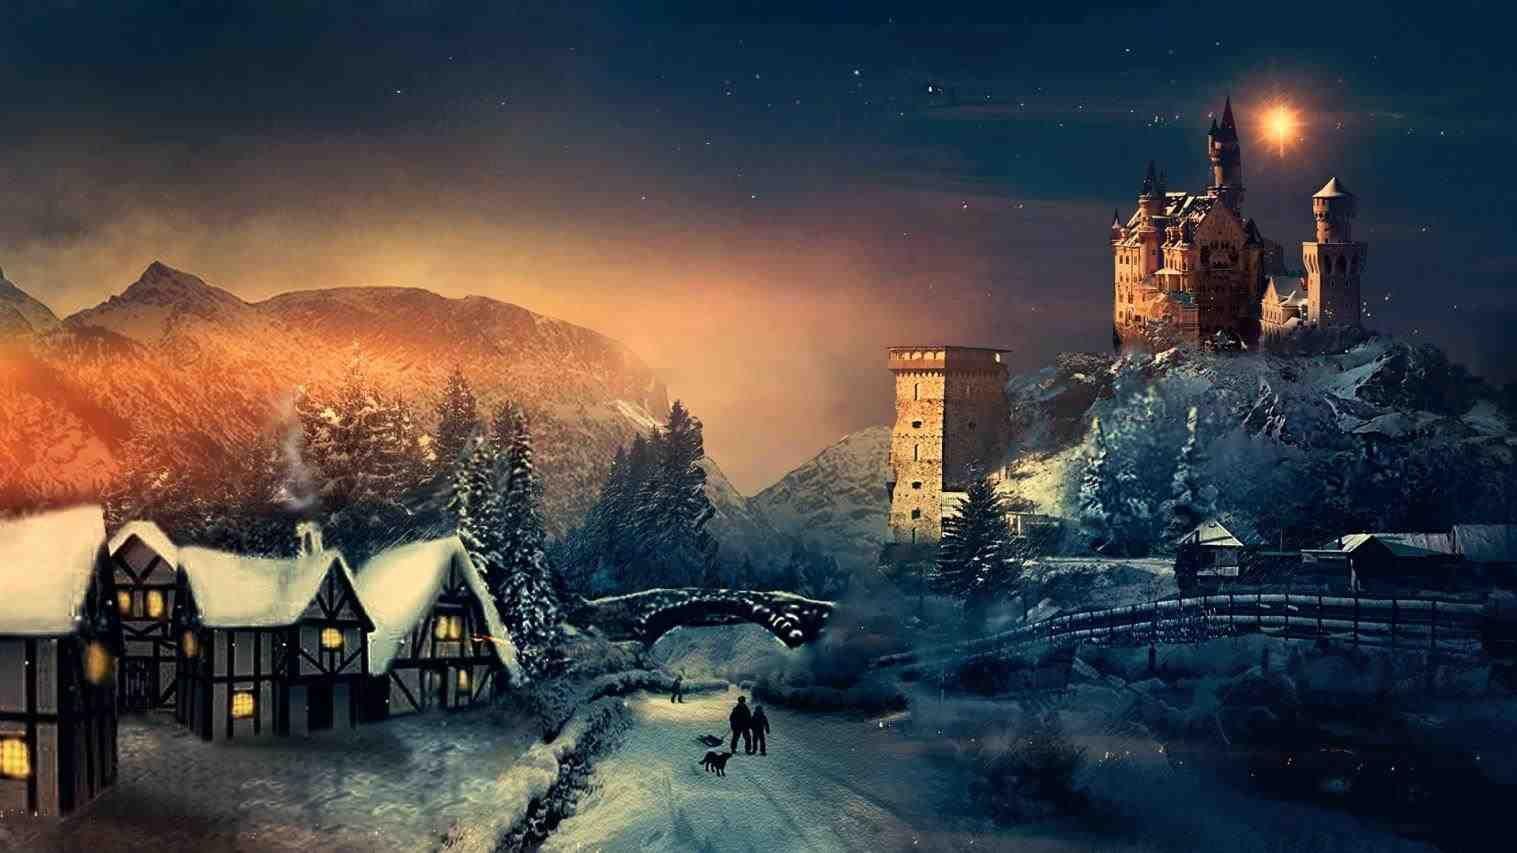 New Post Hd Christmas Wallpapers Tumblr Trendingchemineewebsite